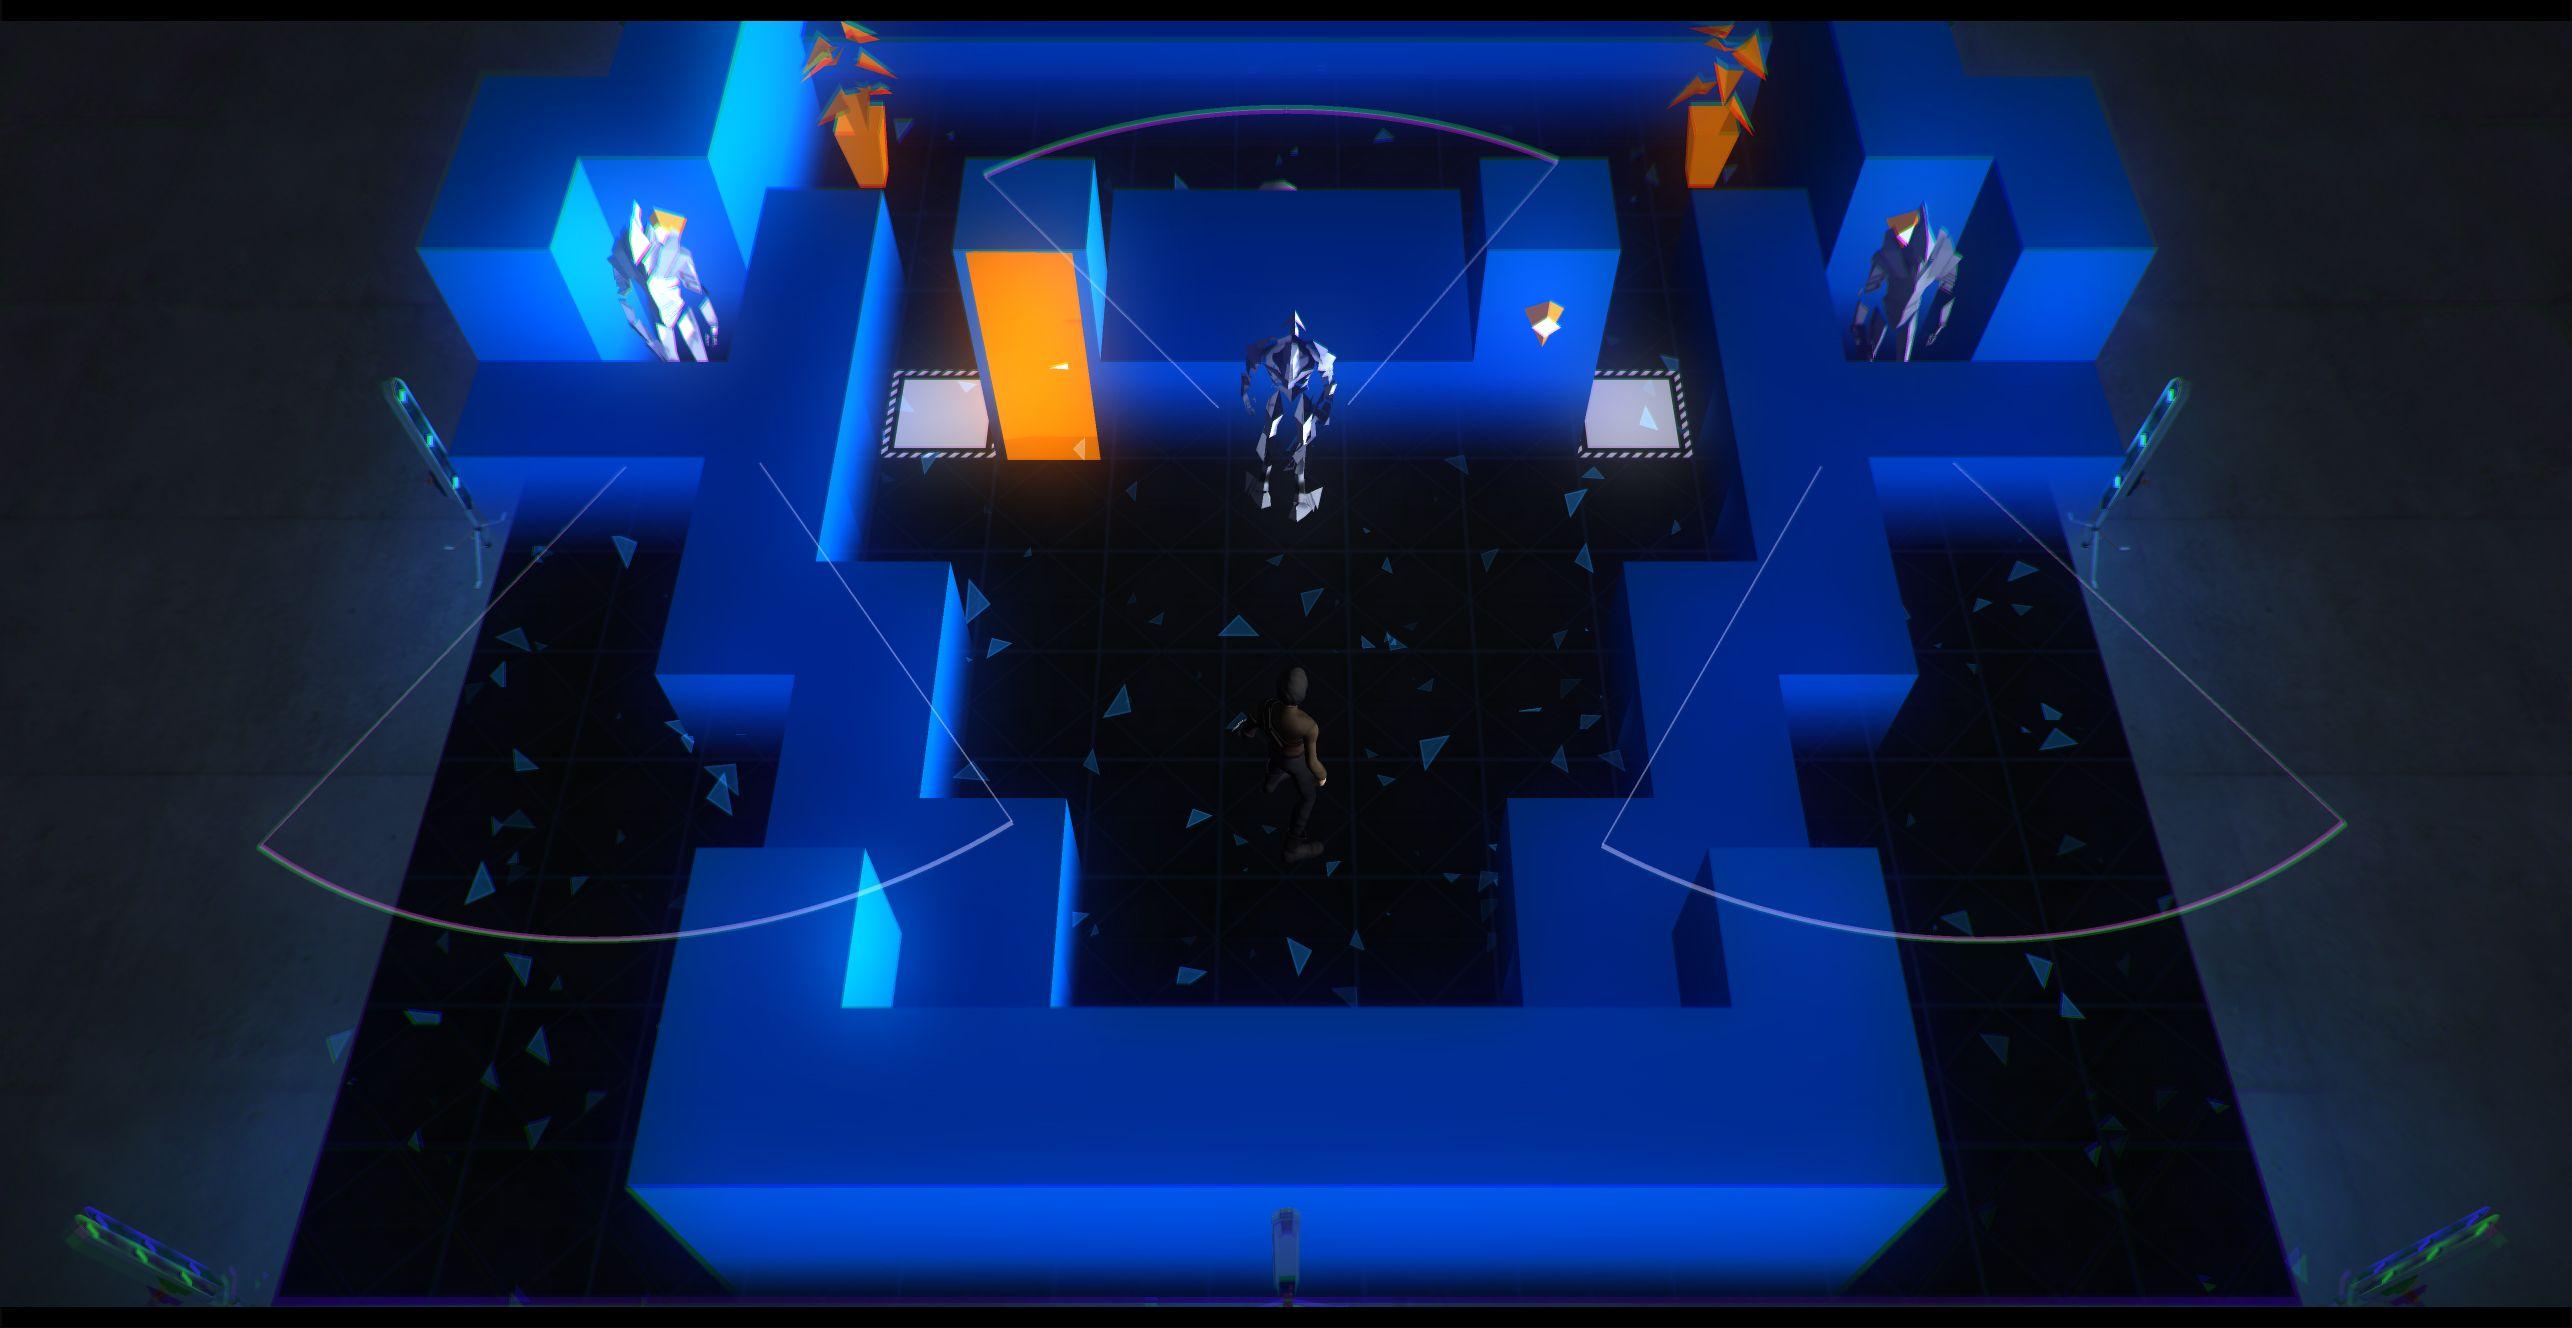 Gamasutra Kevin Wong's Blog Stealth Game Design Games